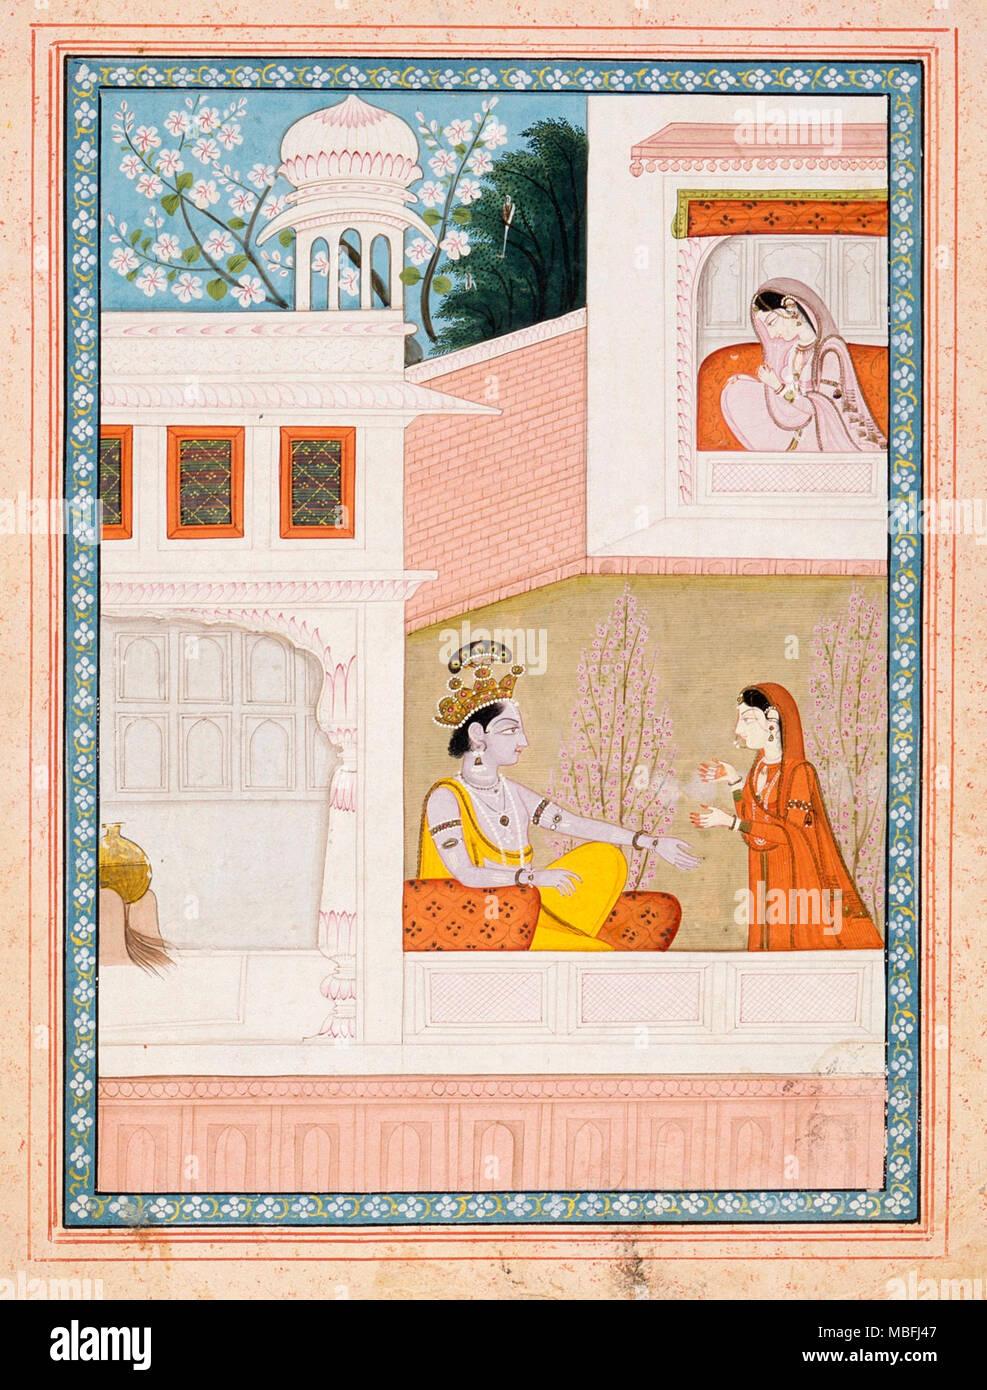 Krishna Talks to Radha's Maidservant - Stock Image